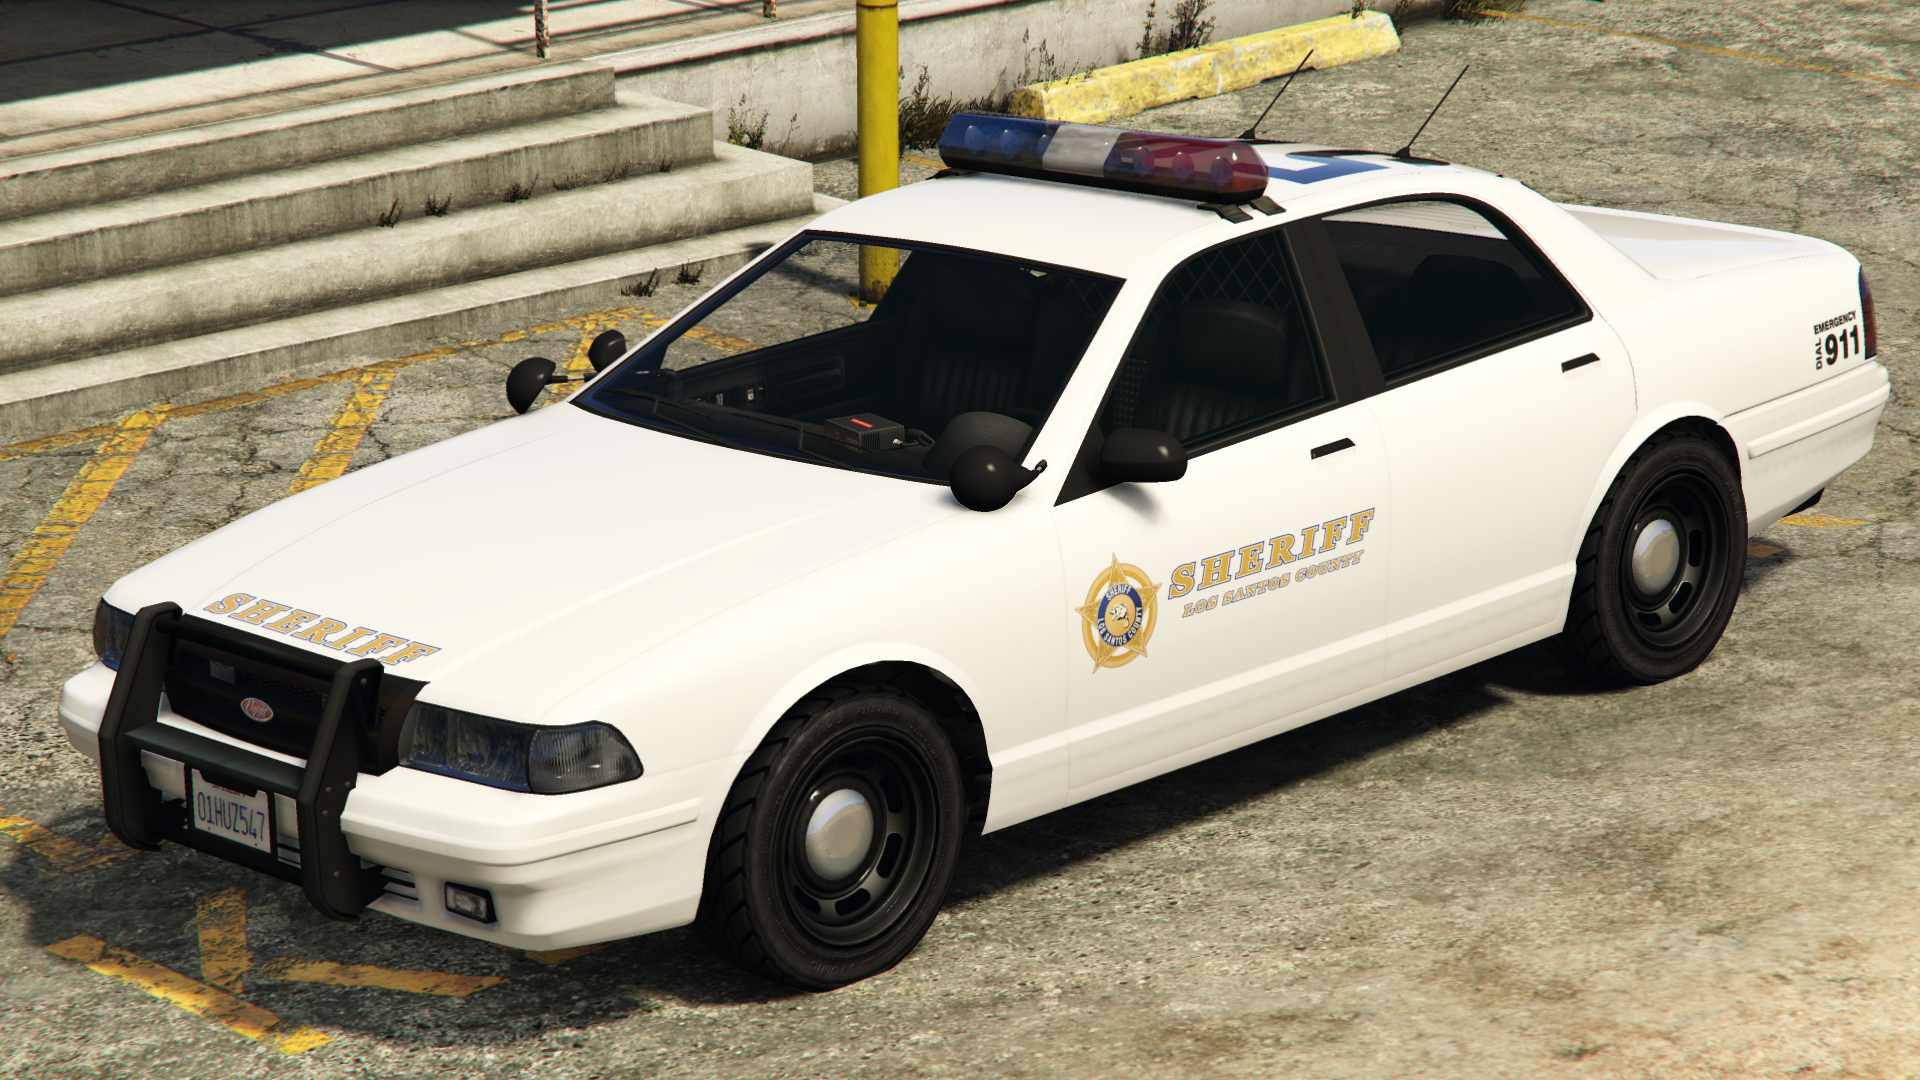 Image - SheriffCruiser-GTAV-front.png | GTA Wiki | FANDOM powered by Wikia